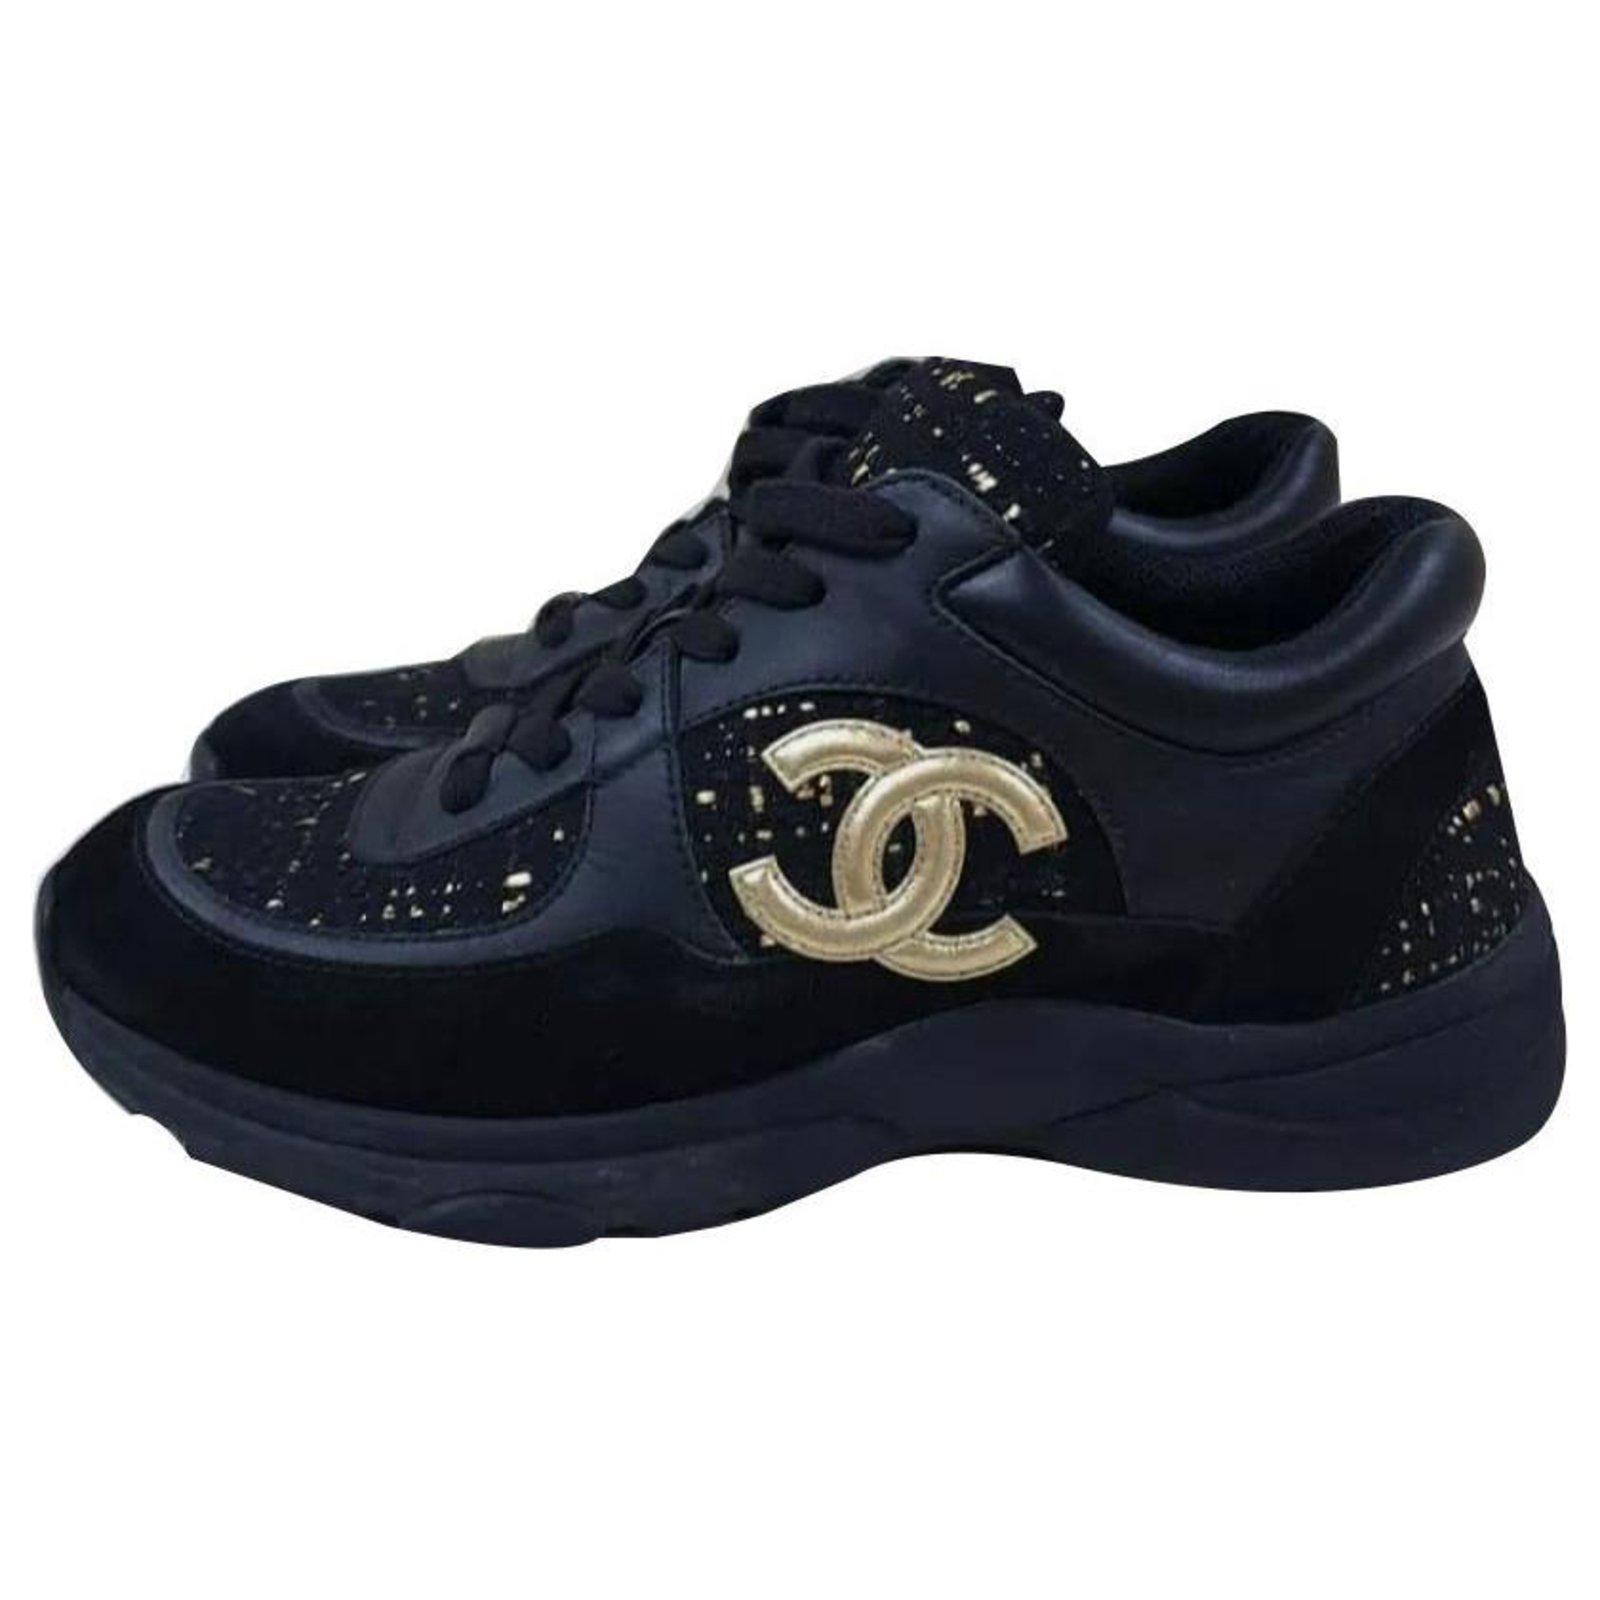 Chanel Chanel 2019 Black Gold CC Logo